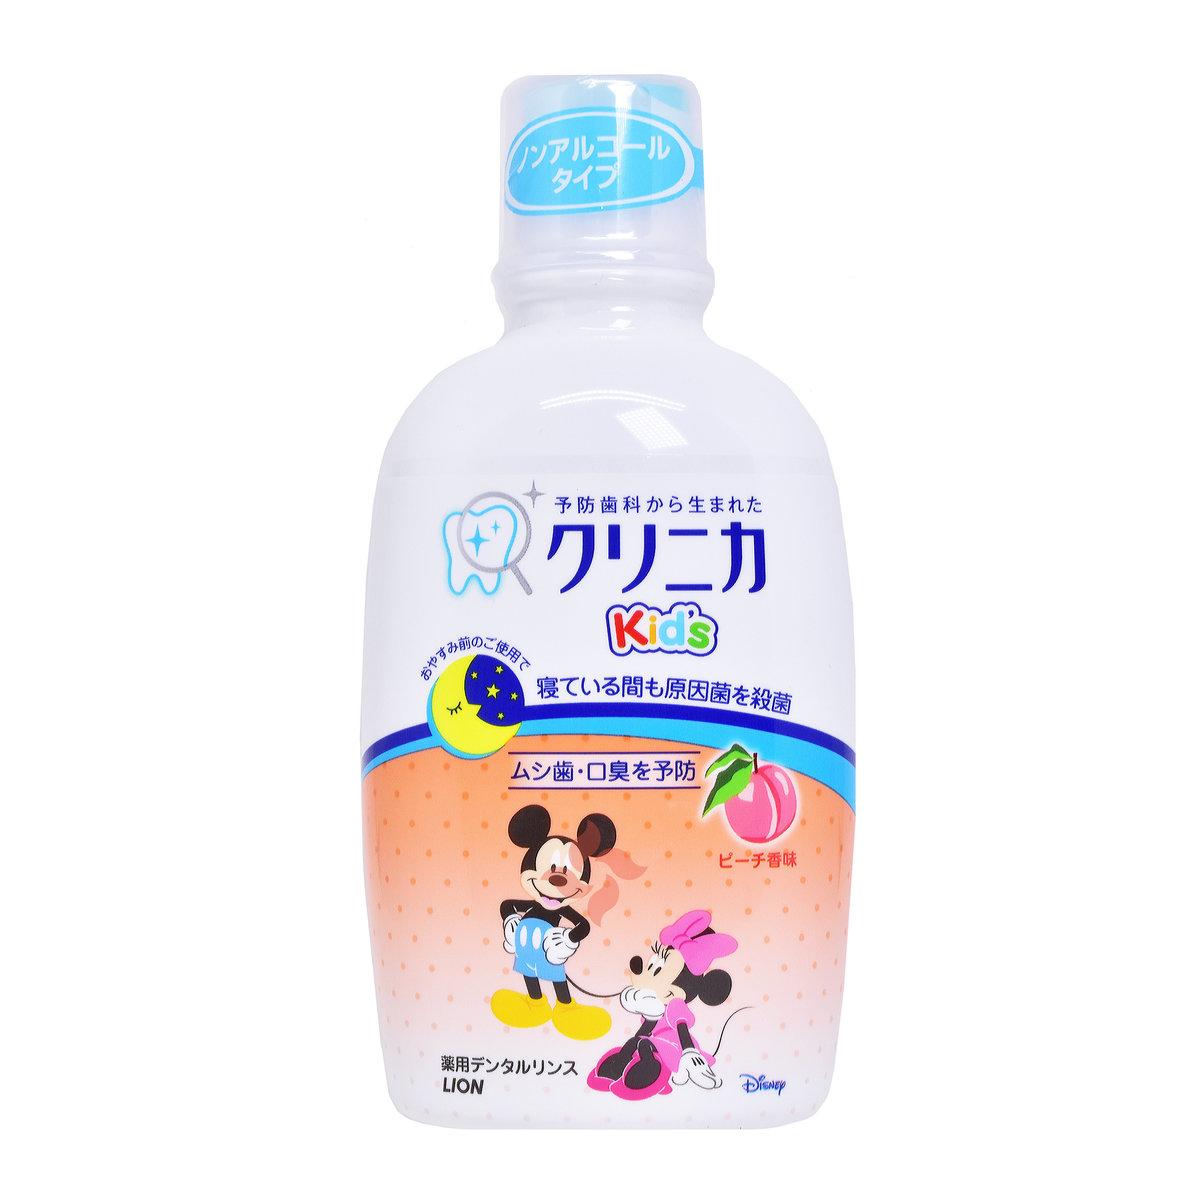 Clinica Kids dental rinse juicy peach 250 ml  (4903301099291)